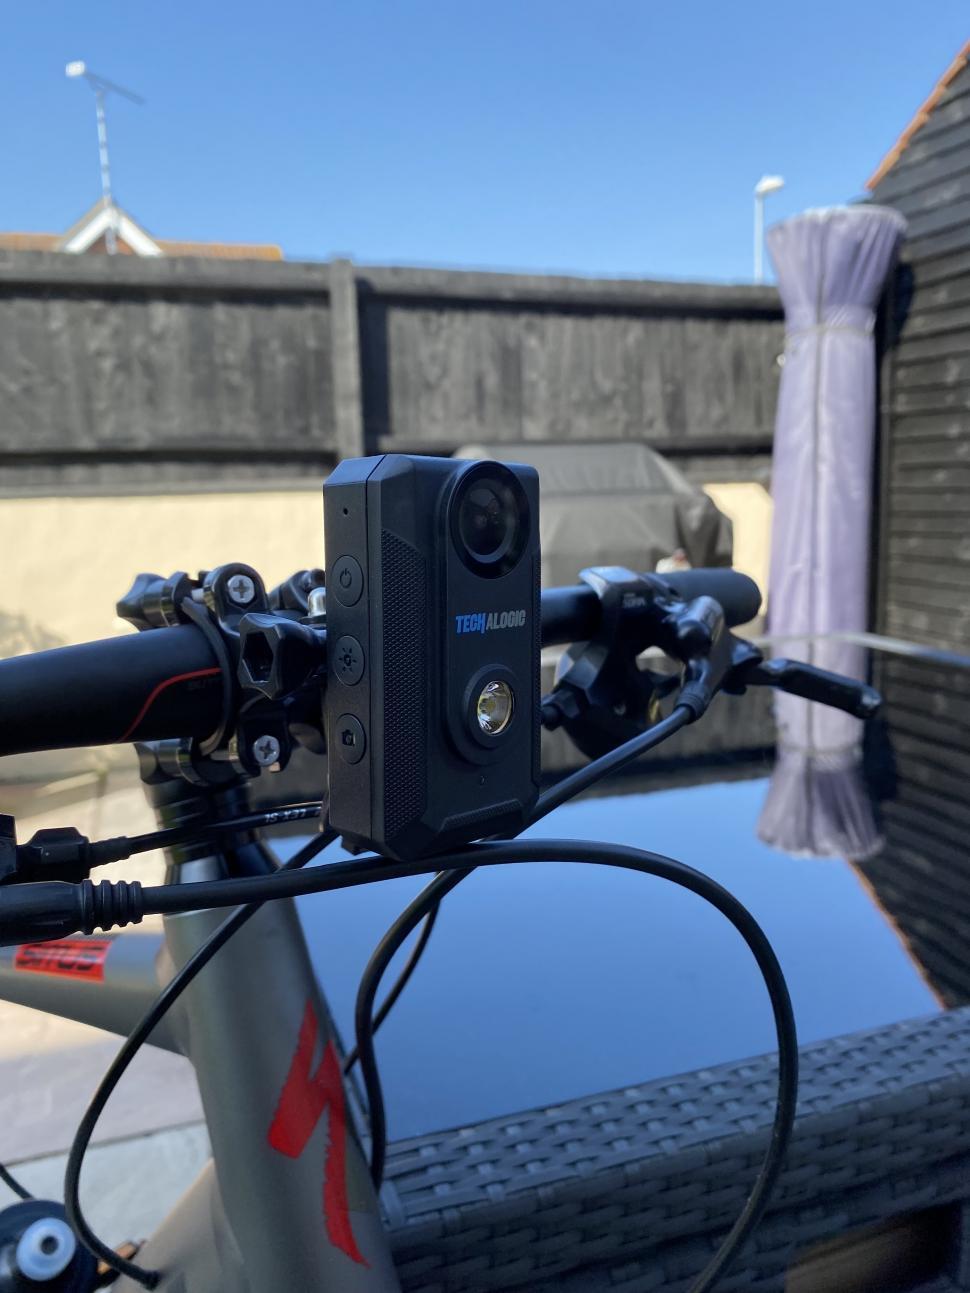 2021 techalogic camera light combo front